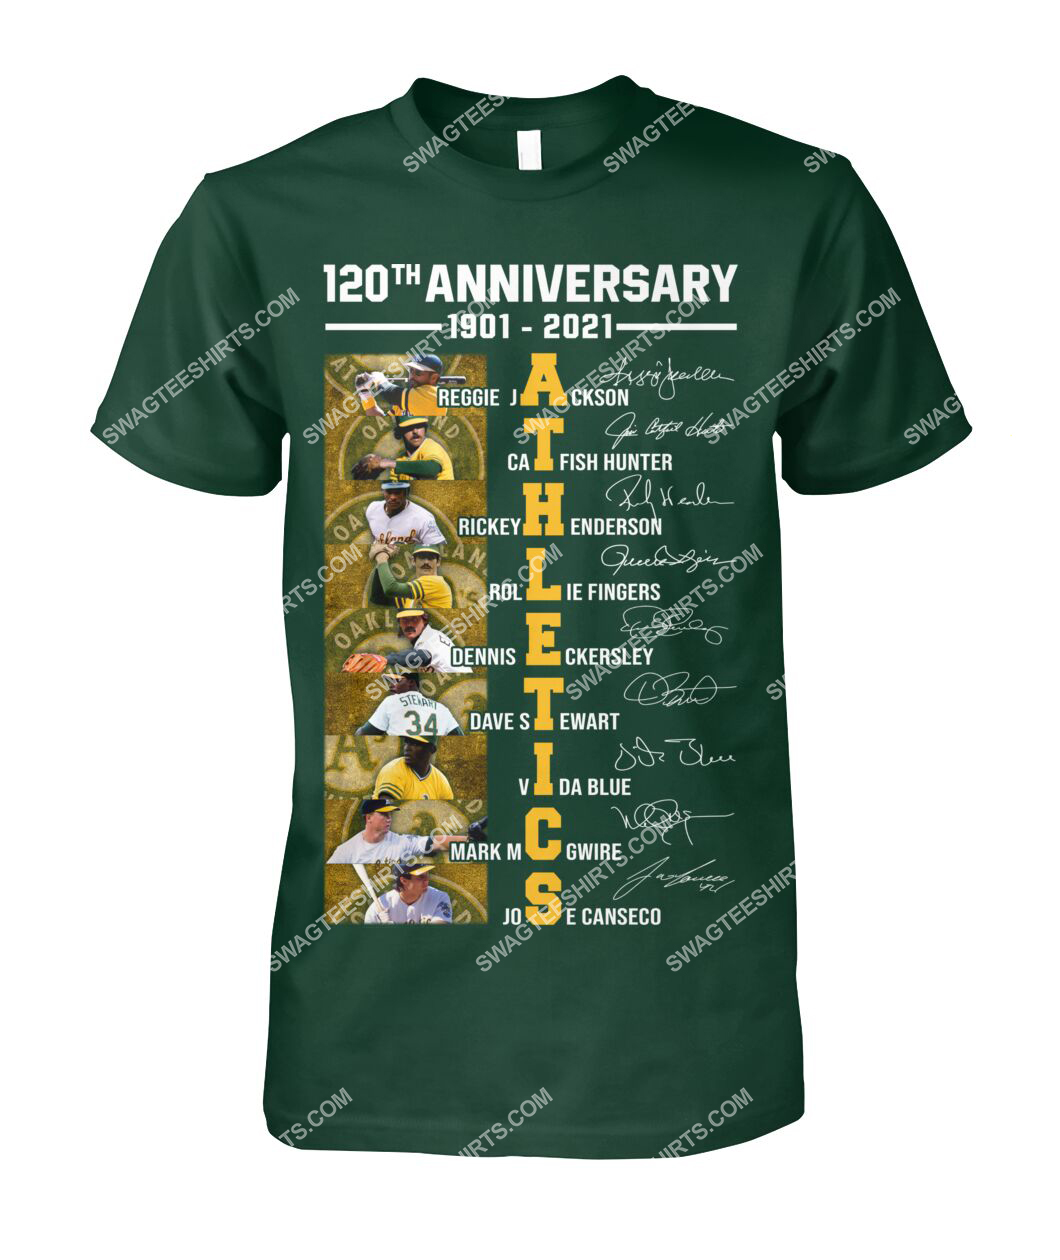 the oakland athletics 120th anniversary 1901 2021 signatures mlb tshirt 1